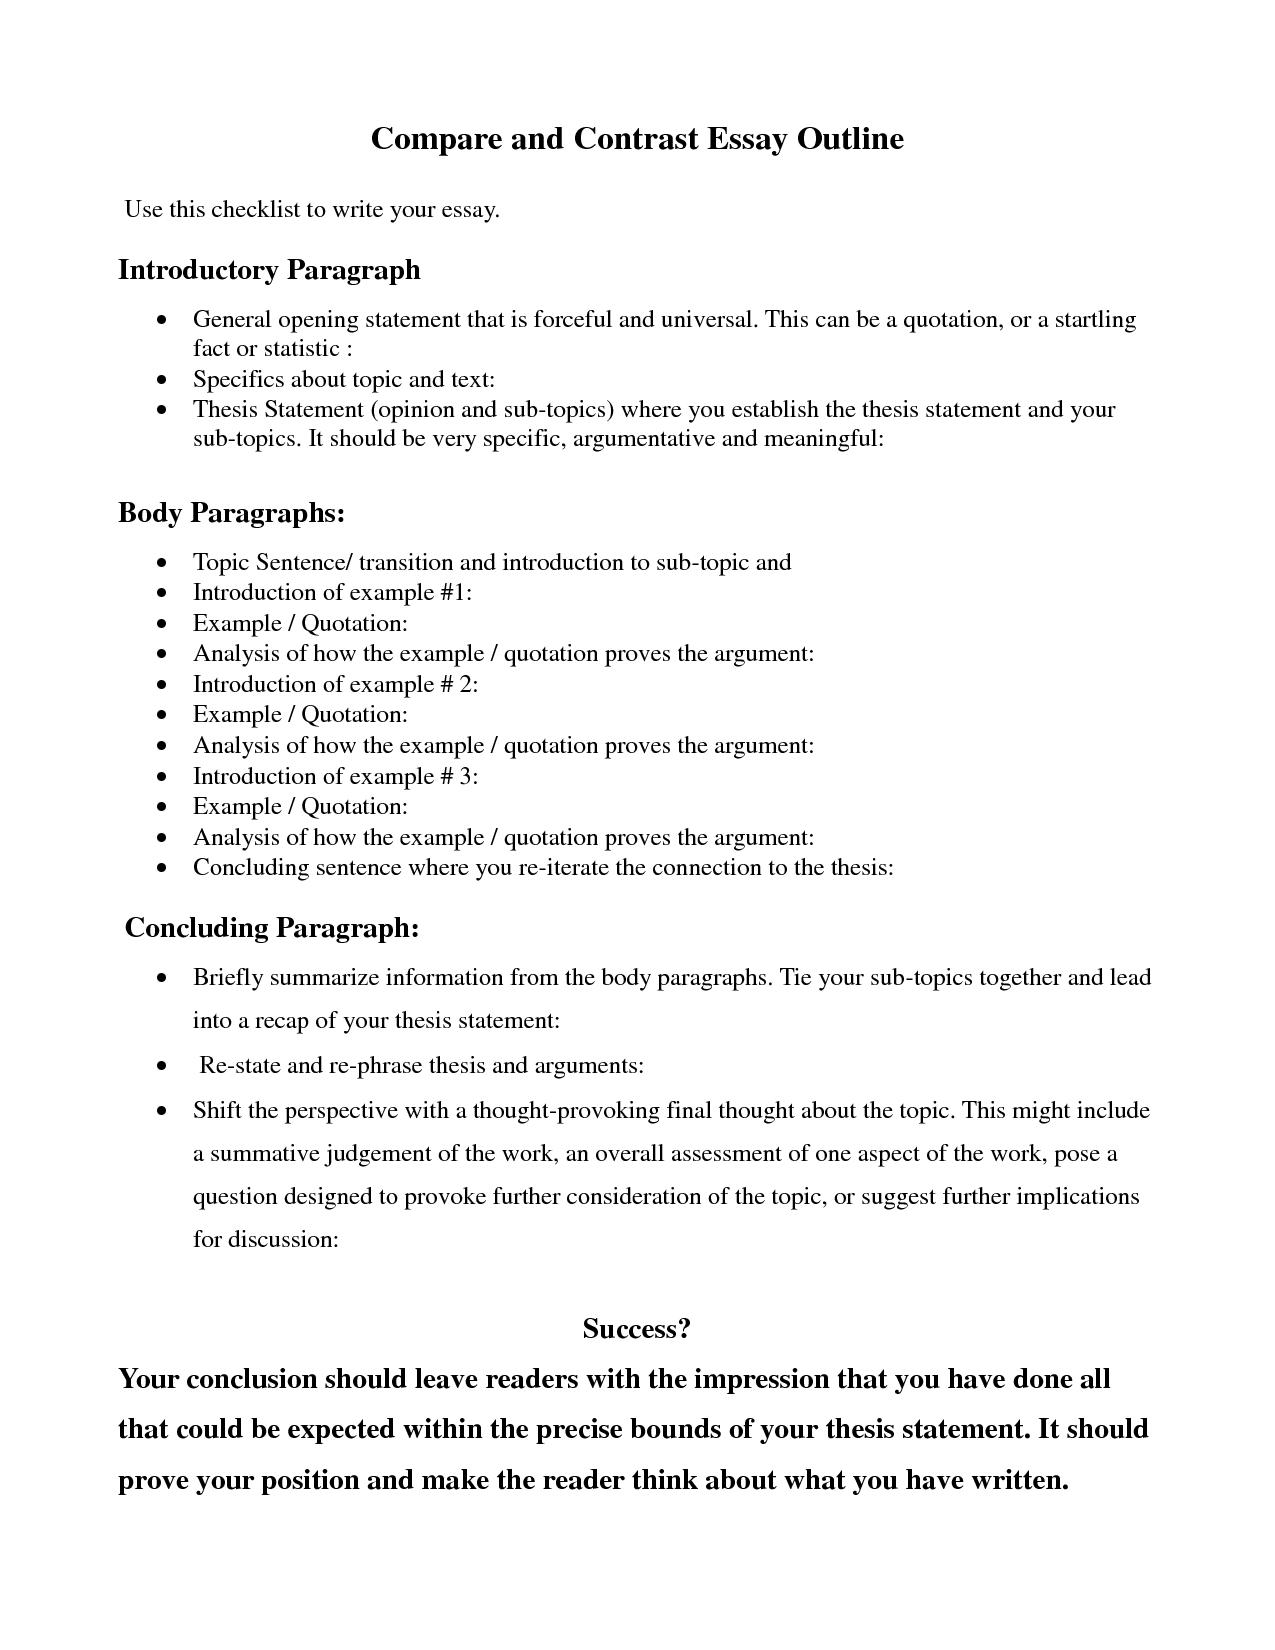 College level compare and contrast essay topics